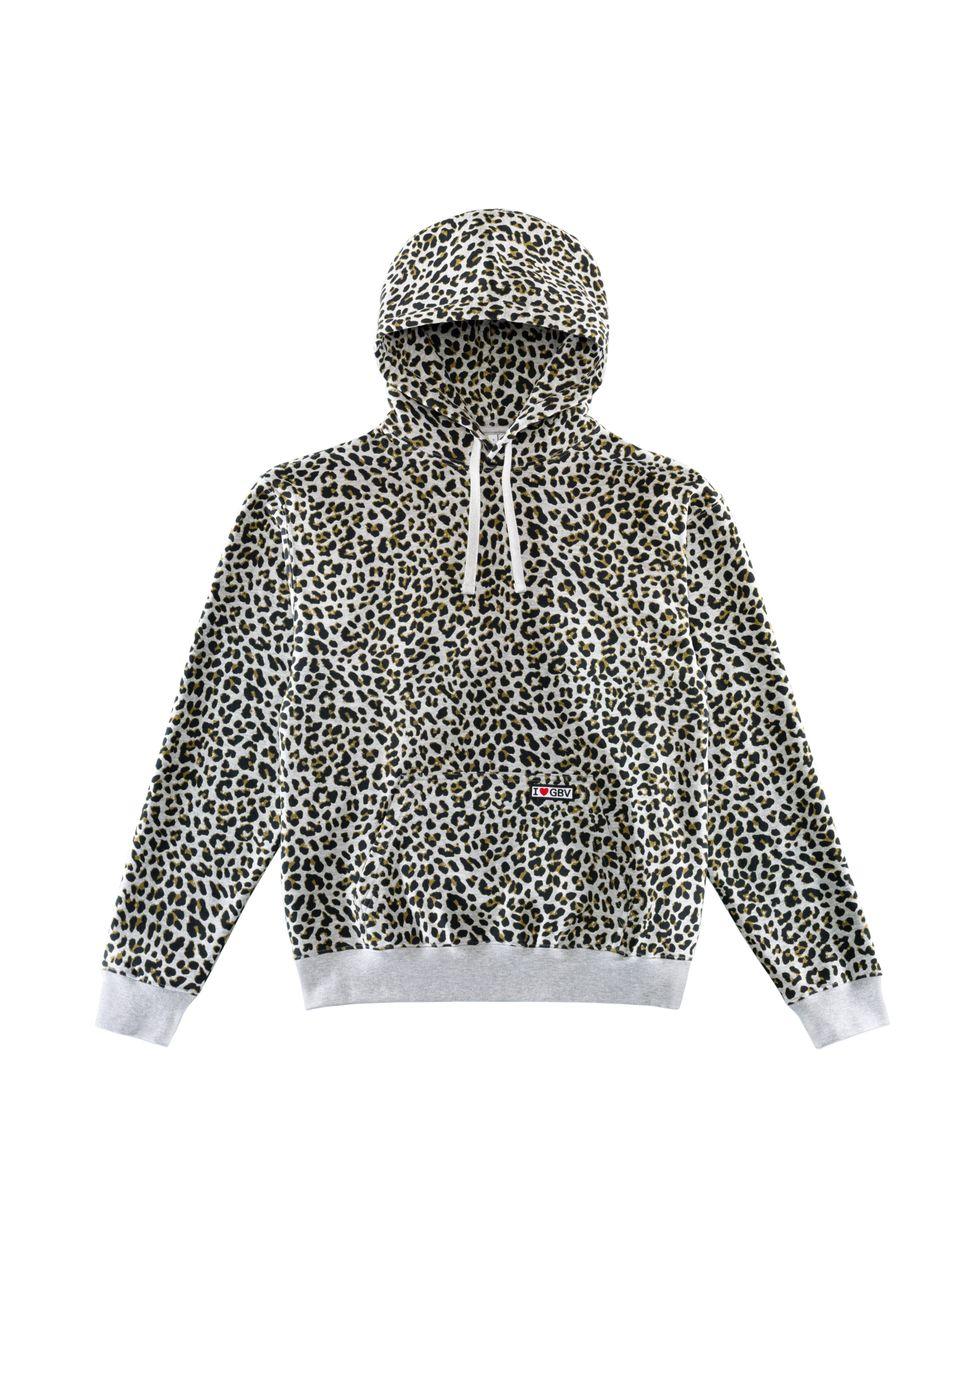 GV Leopard Print Hoody